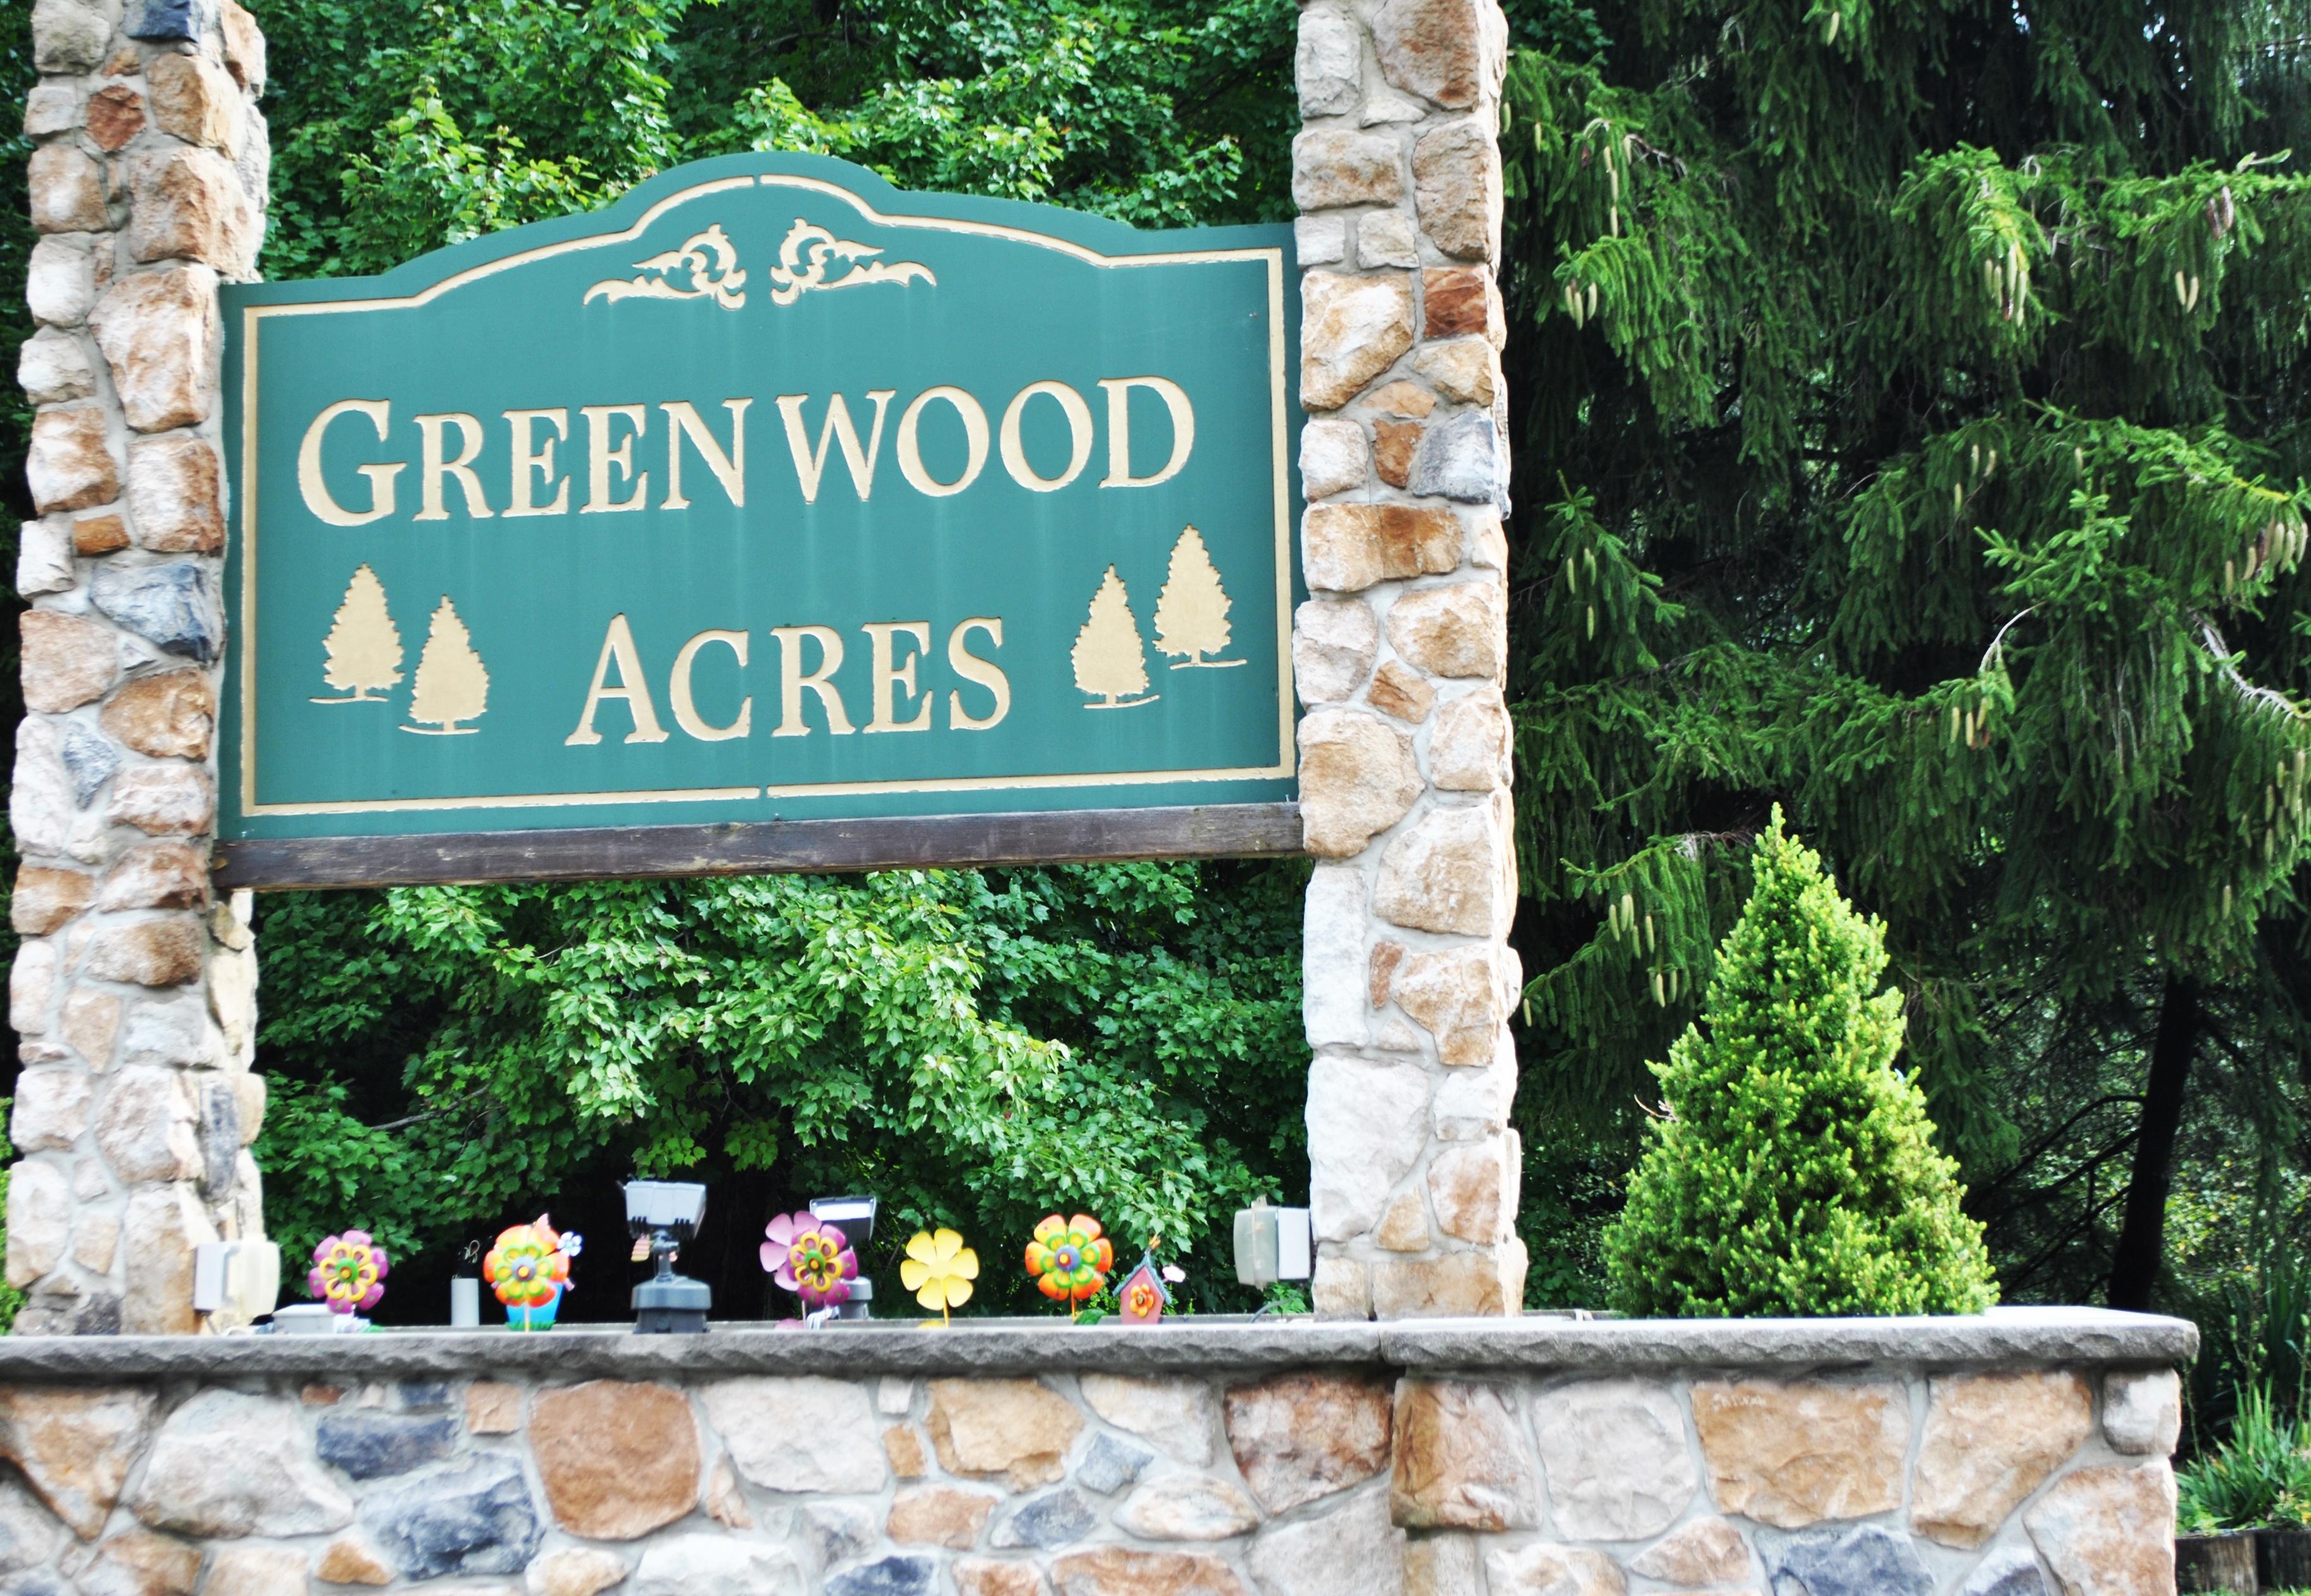 GreenwoodAcresSign.jpg